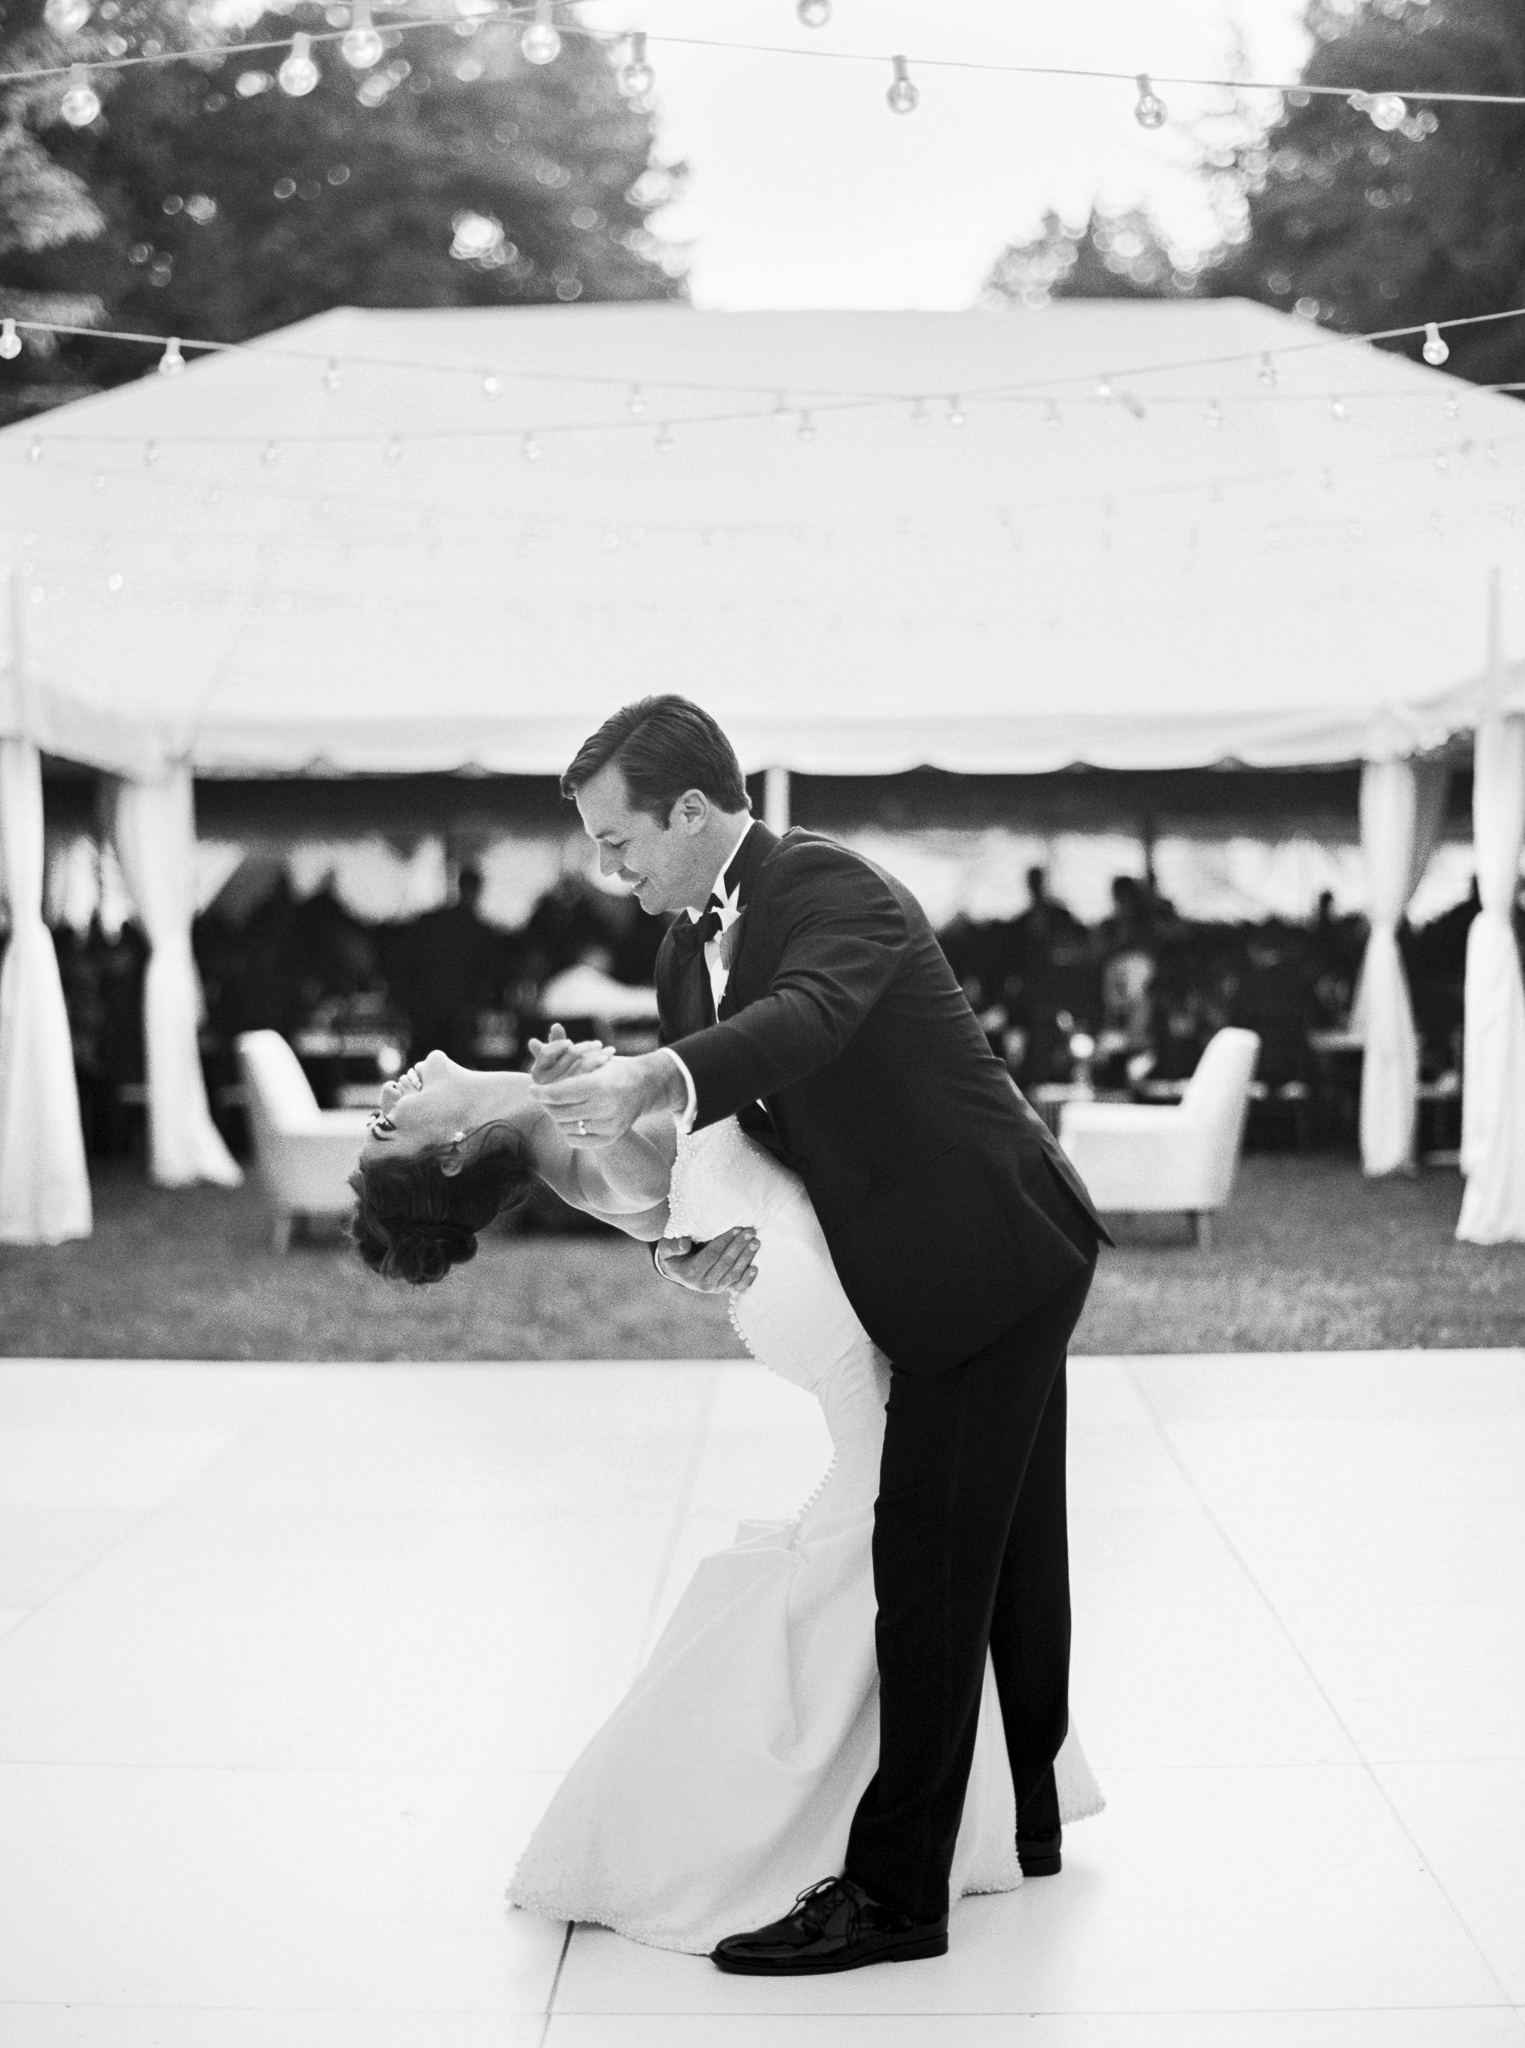 181OutliveCreative_Travel_Photographer_Videographer_Lewis&Clark_Oregon_Elegant_BlackTie_Destination_Wedding.jpg